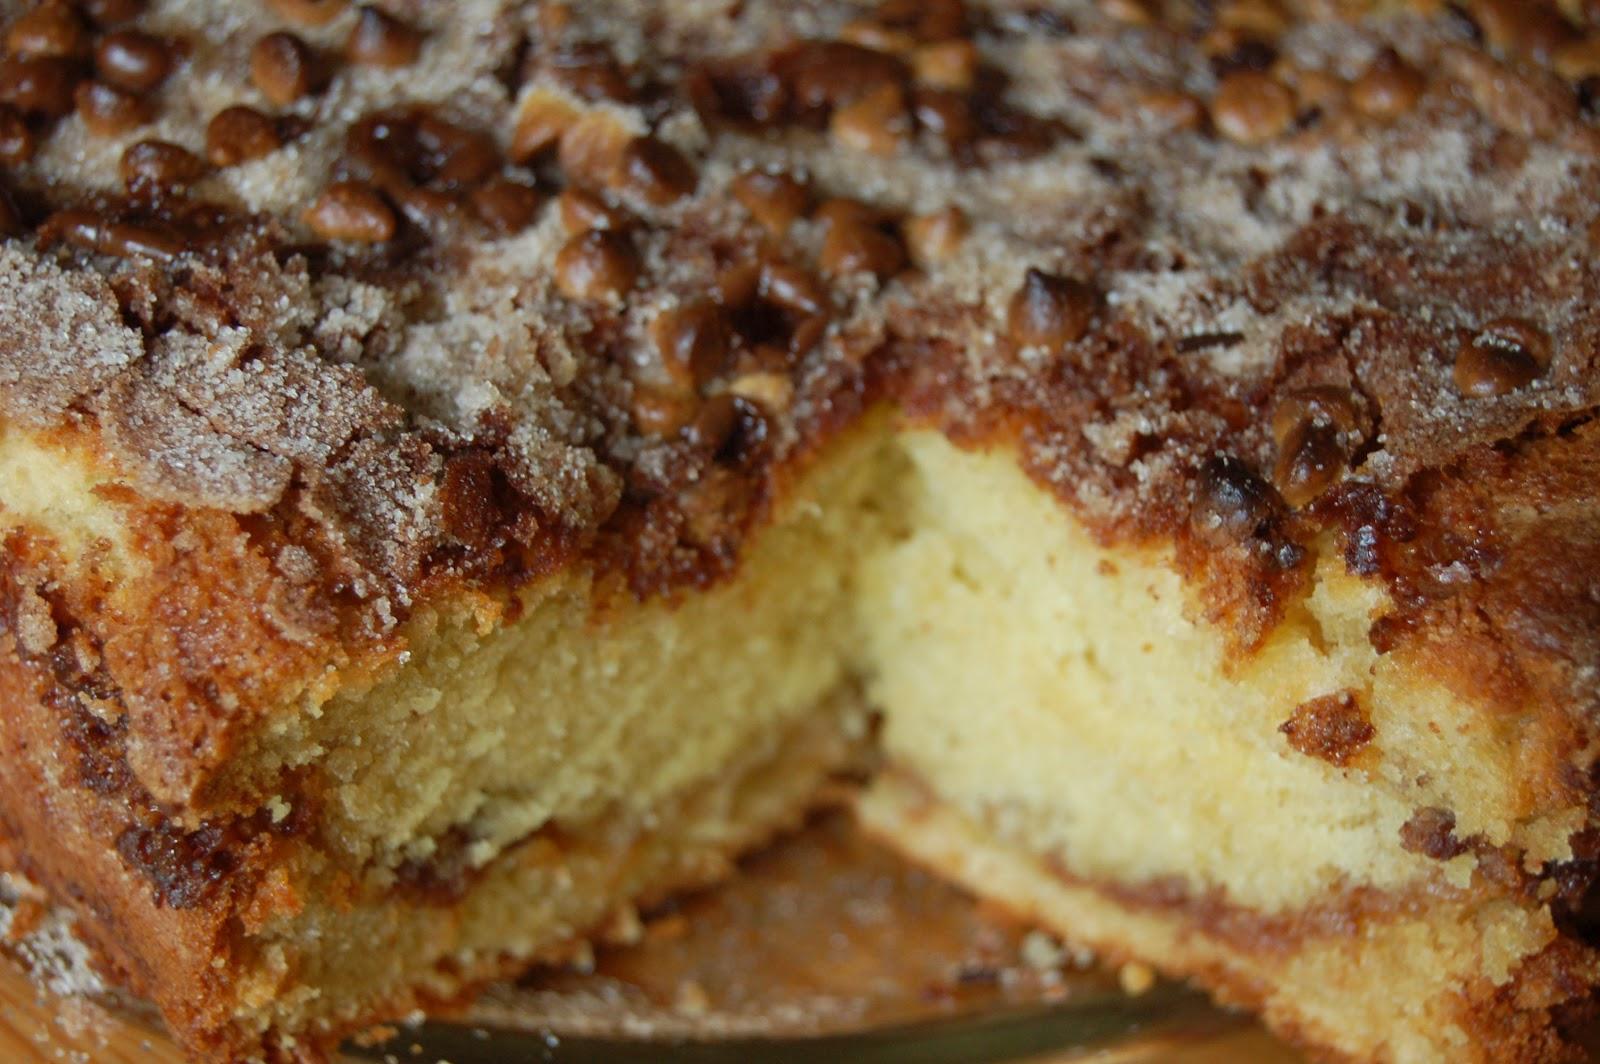 liebe: Chocolate Chip Sour Cream Coffee Cake